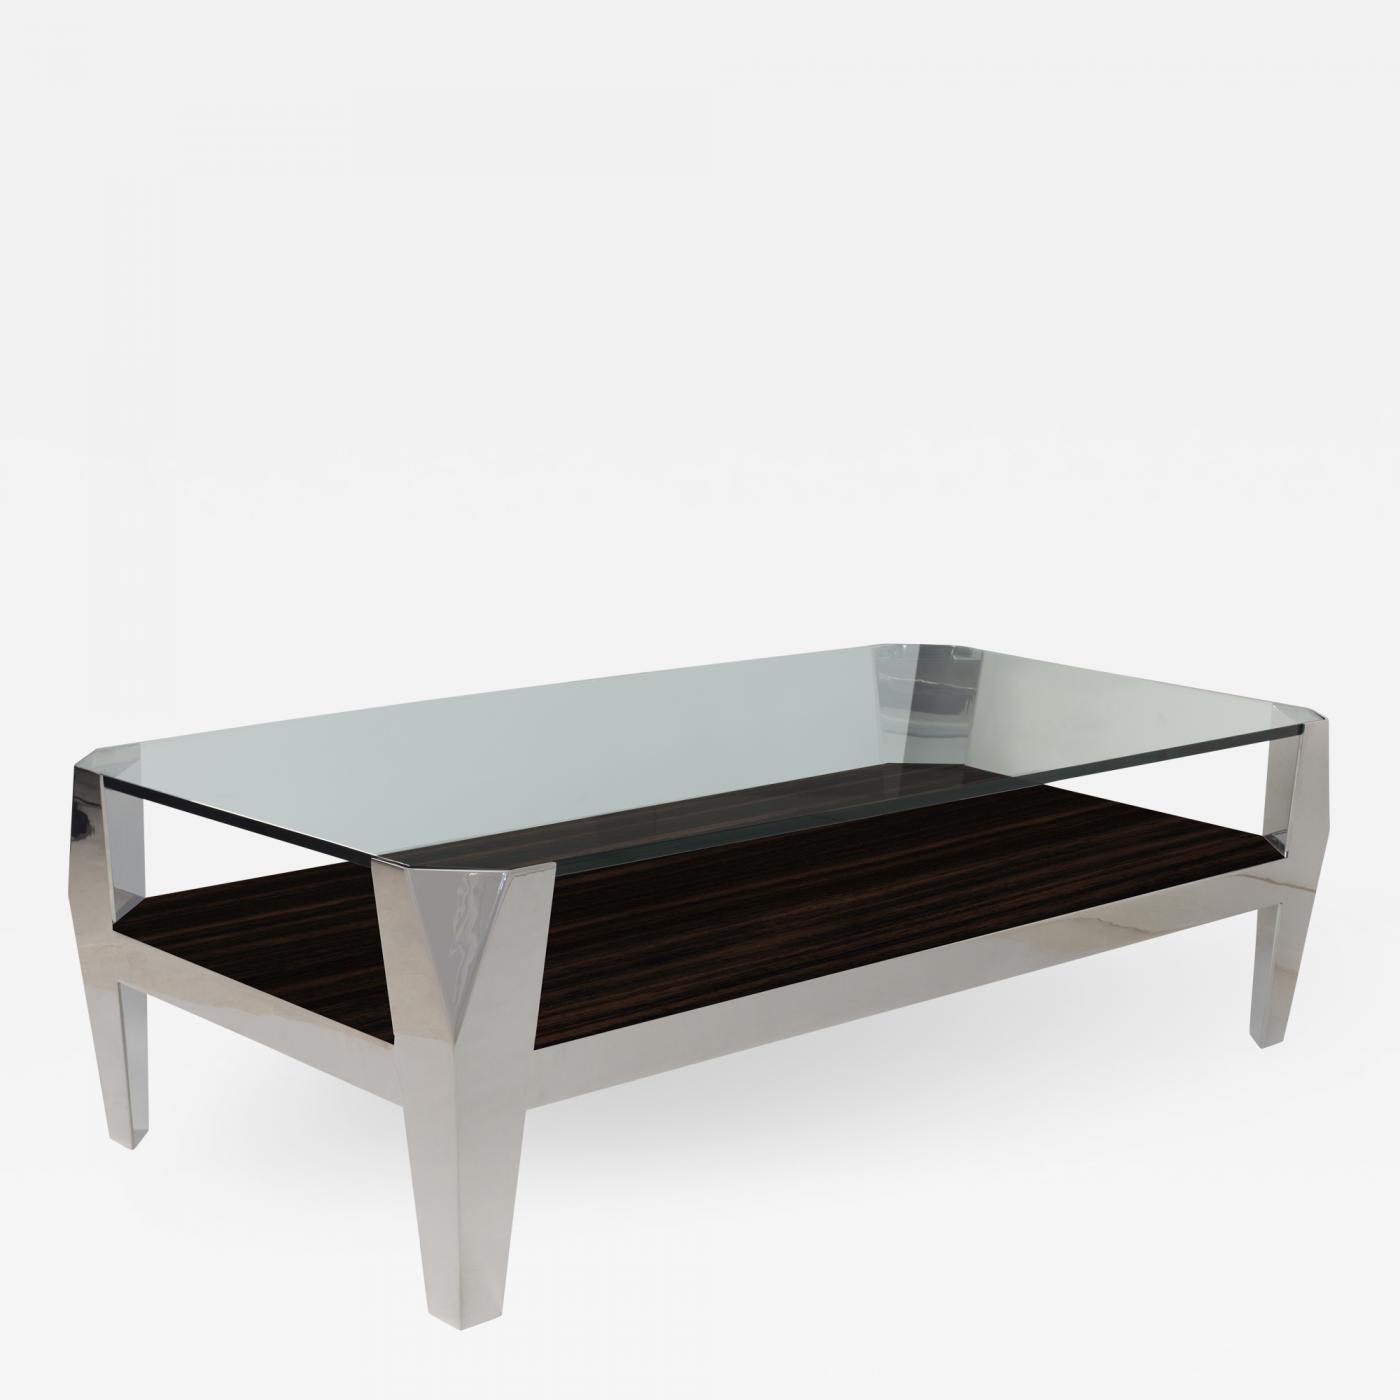 Stephen Tomar Furniture Orbit Coffee Table With Wood Shelf - Orbit coffee table